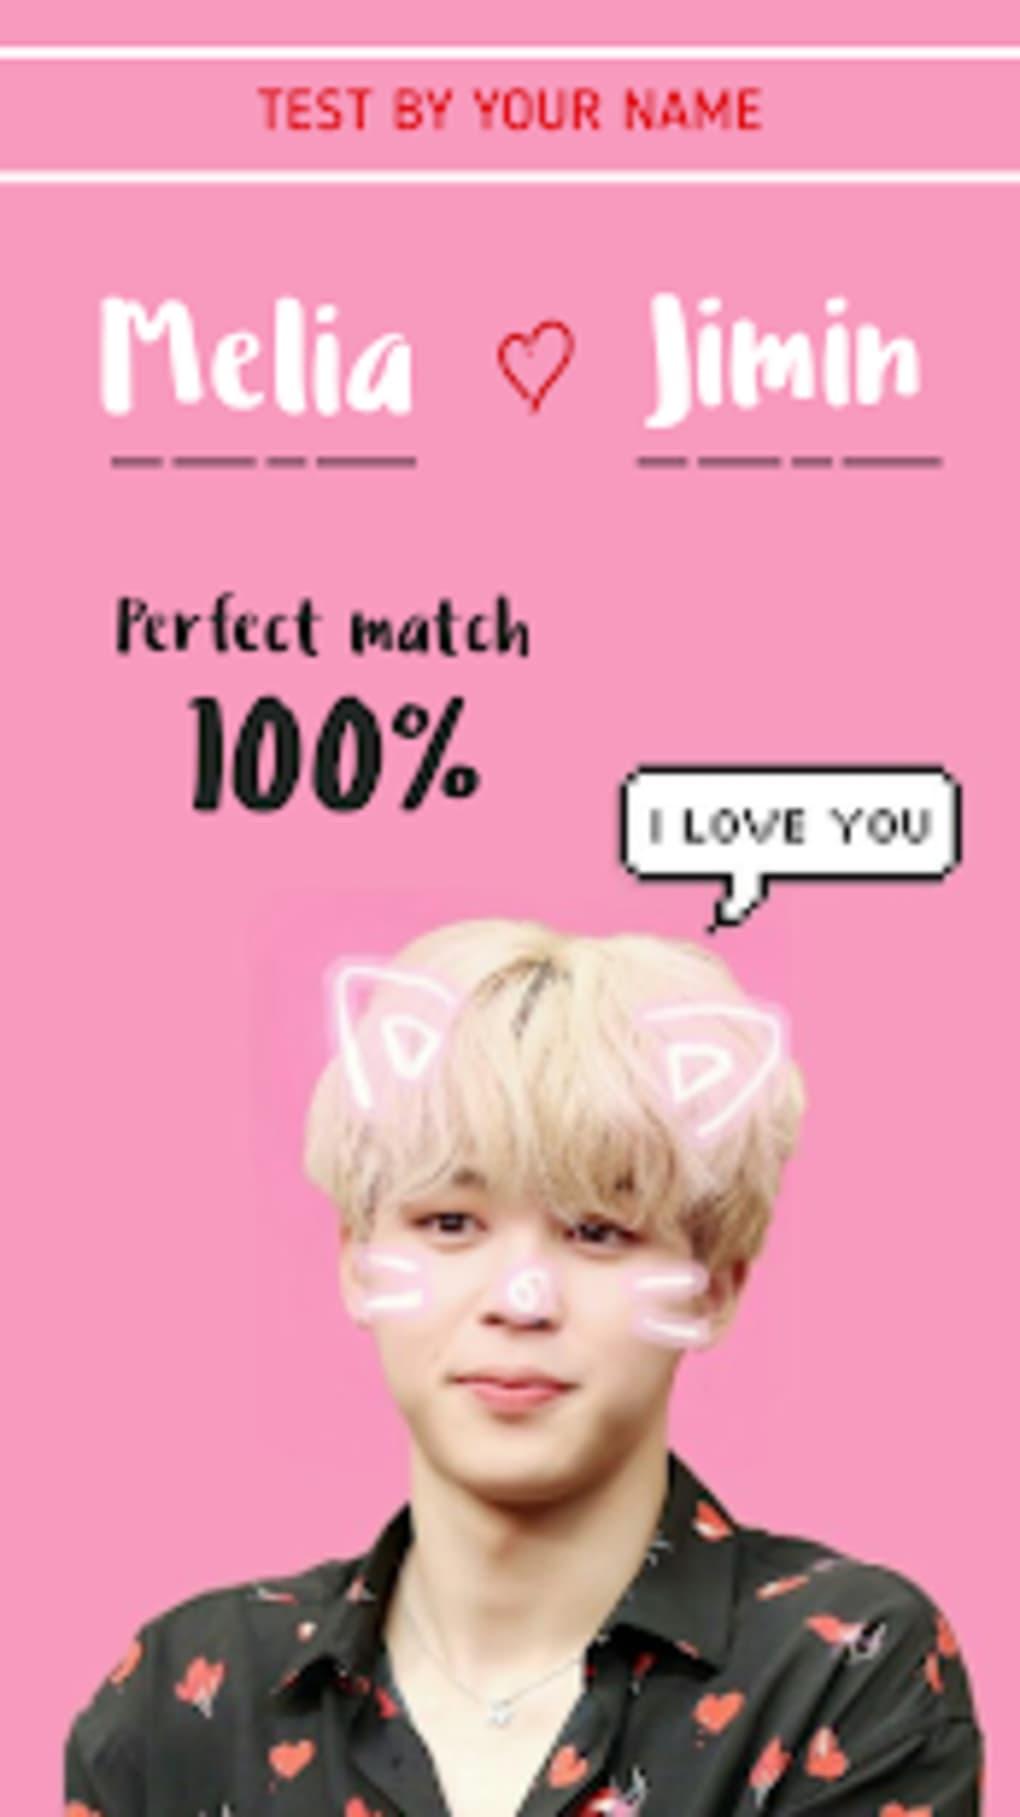 BTS Love Me - BTS Member Love Test for Android - Download